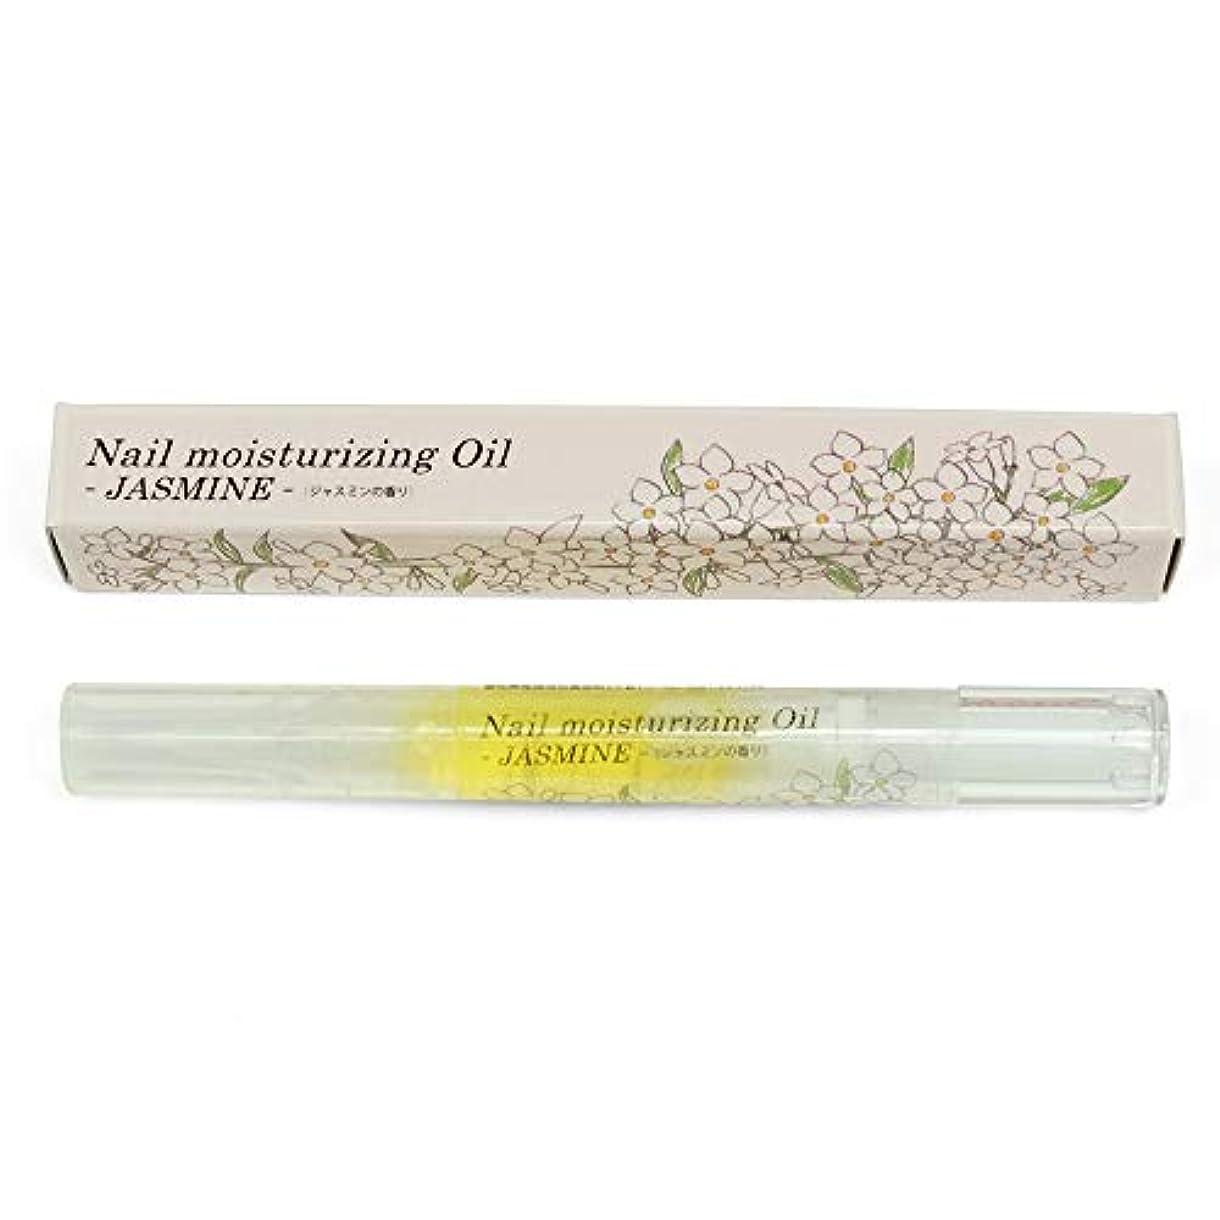 ease Nail moisturizing Oil ネイルオイルペン(ジャスミンの香り) 2ml